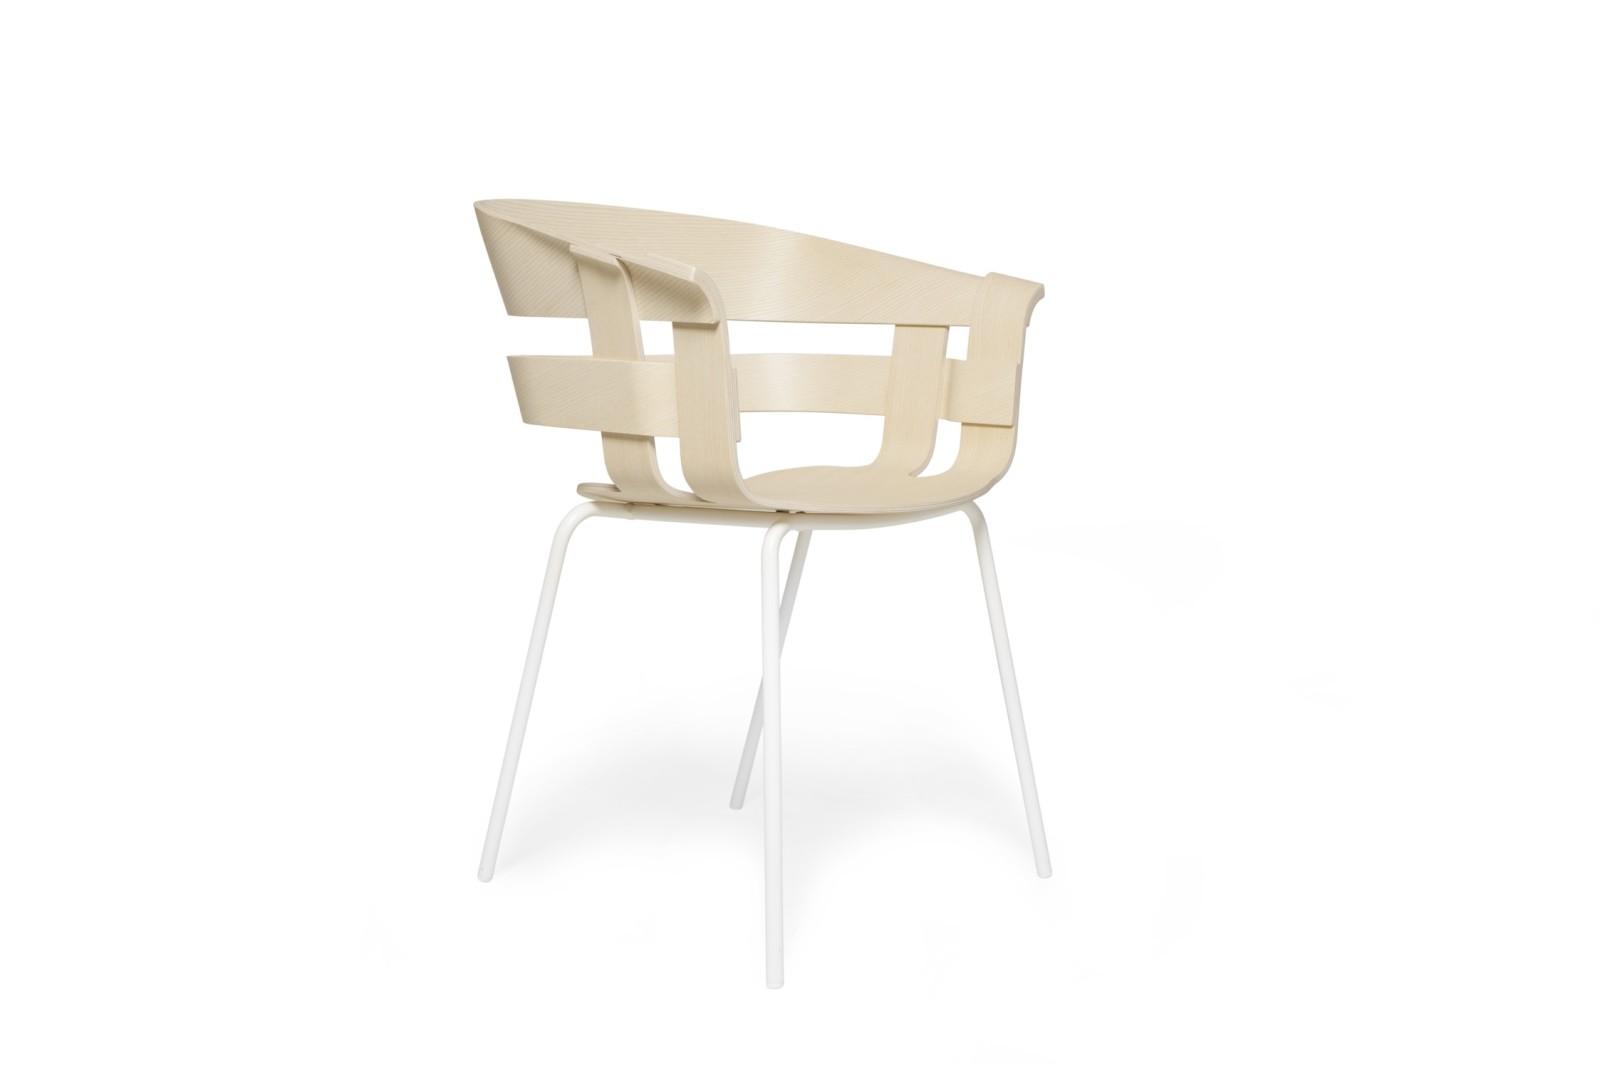 Wick Chair - Metal Legs Ash seat, white legs